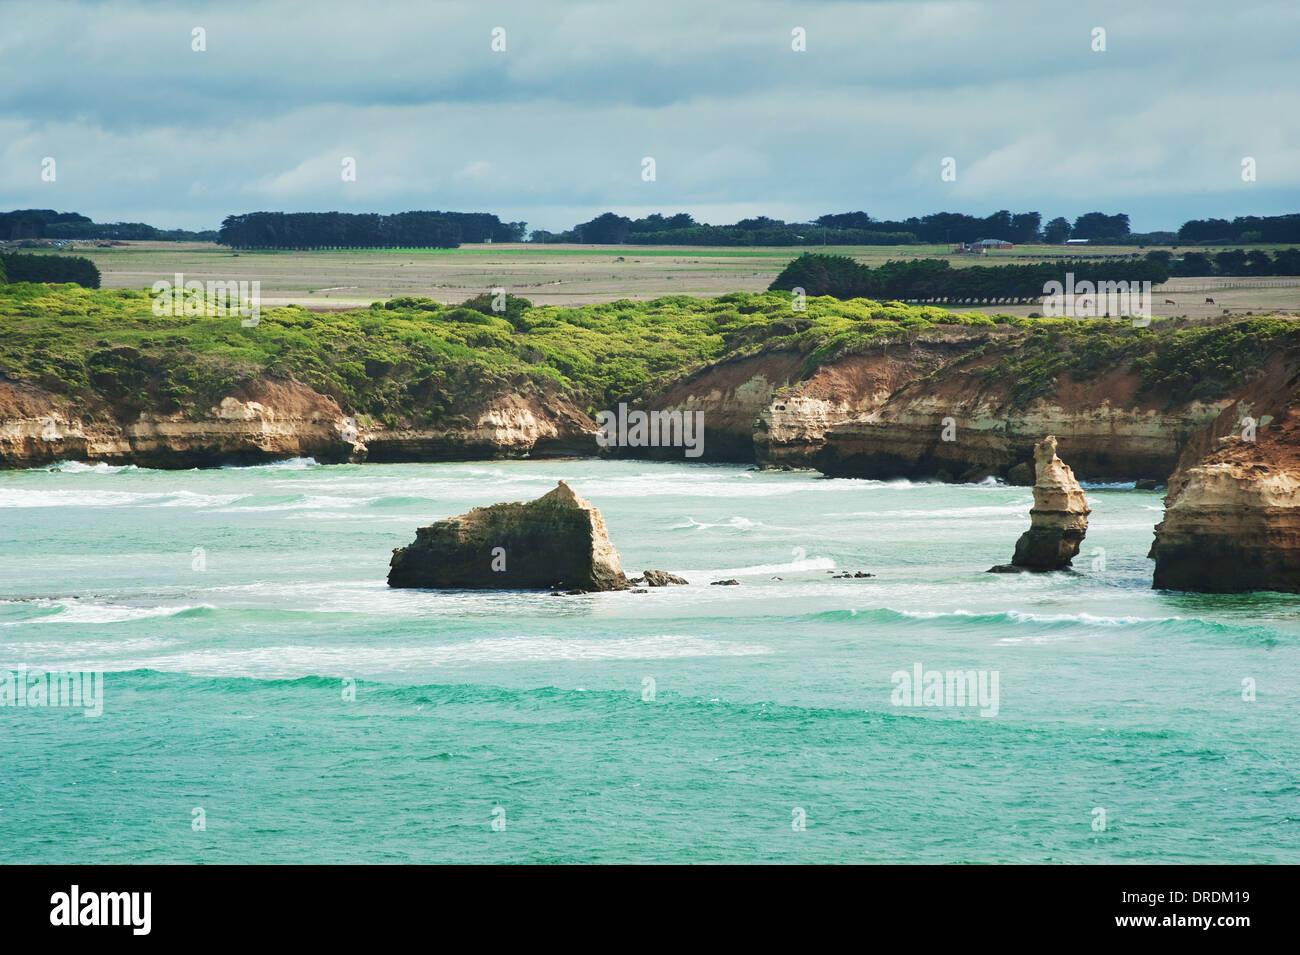 famous Rocks in the Bay of Islands Coastal Park,Great Ocean Road, Australia Stock Photo